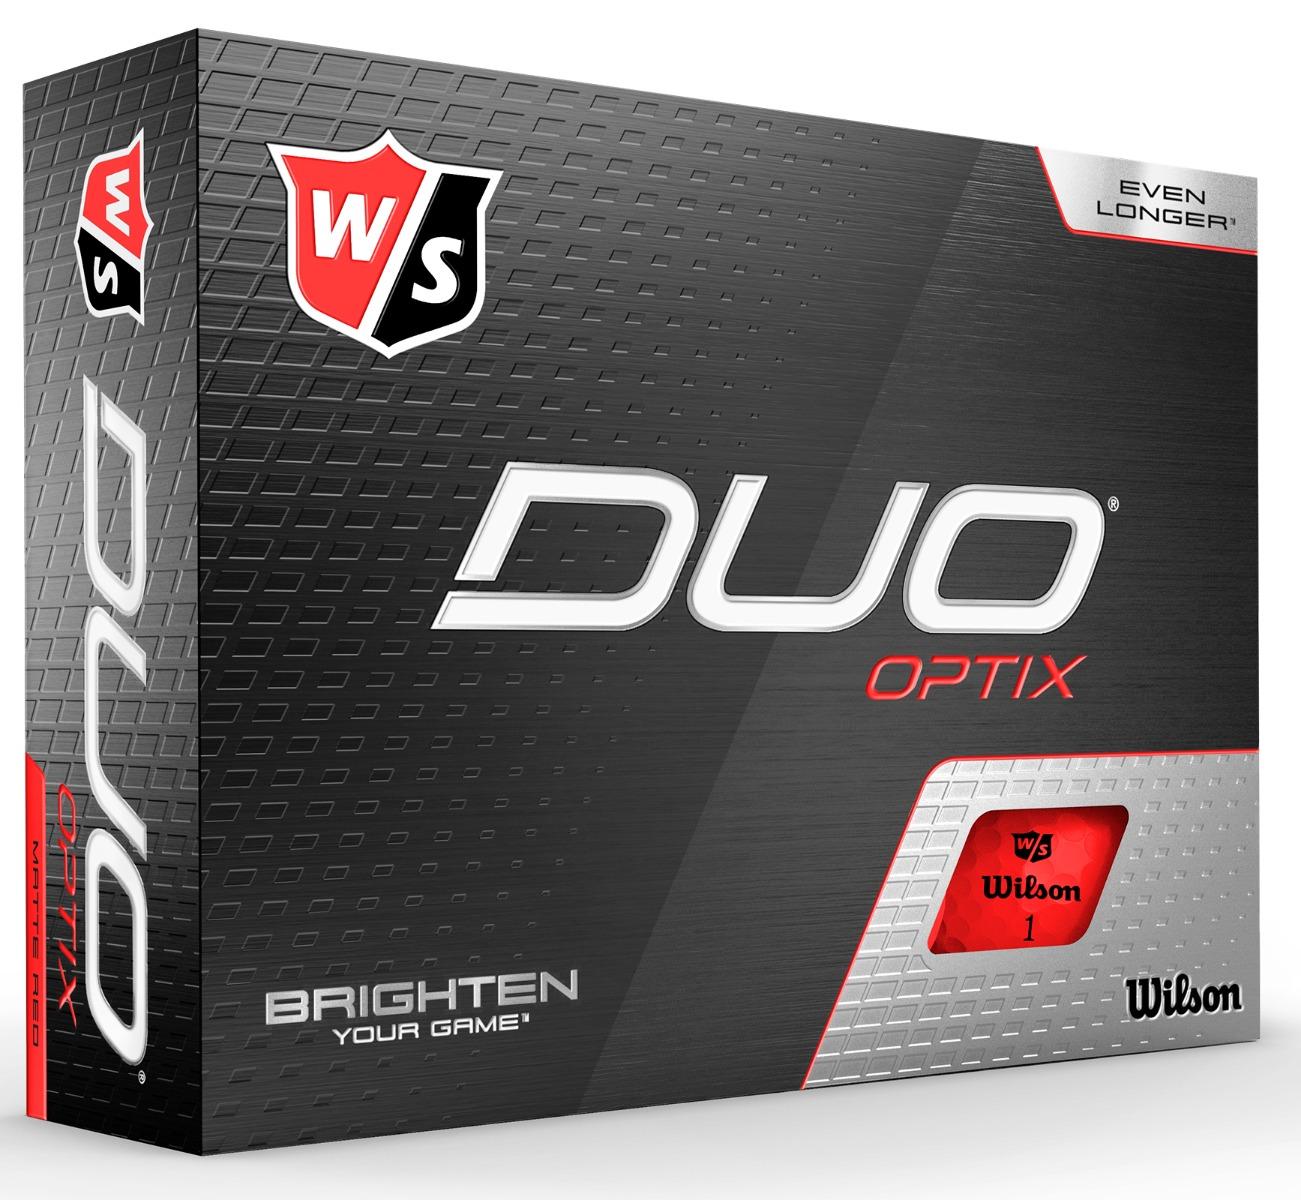 https://www.best4balls.com/pub/media/catalog/product/d/u/duo_optix_red_box_600.jpg